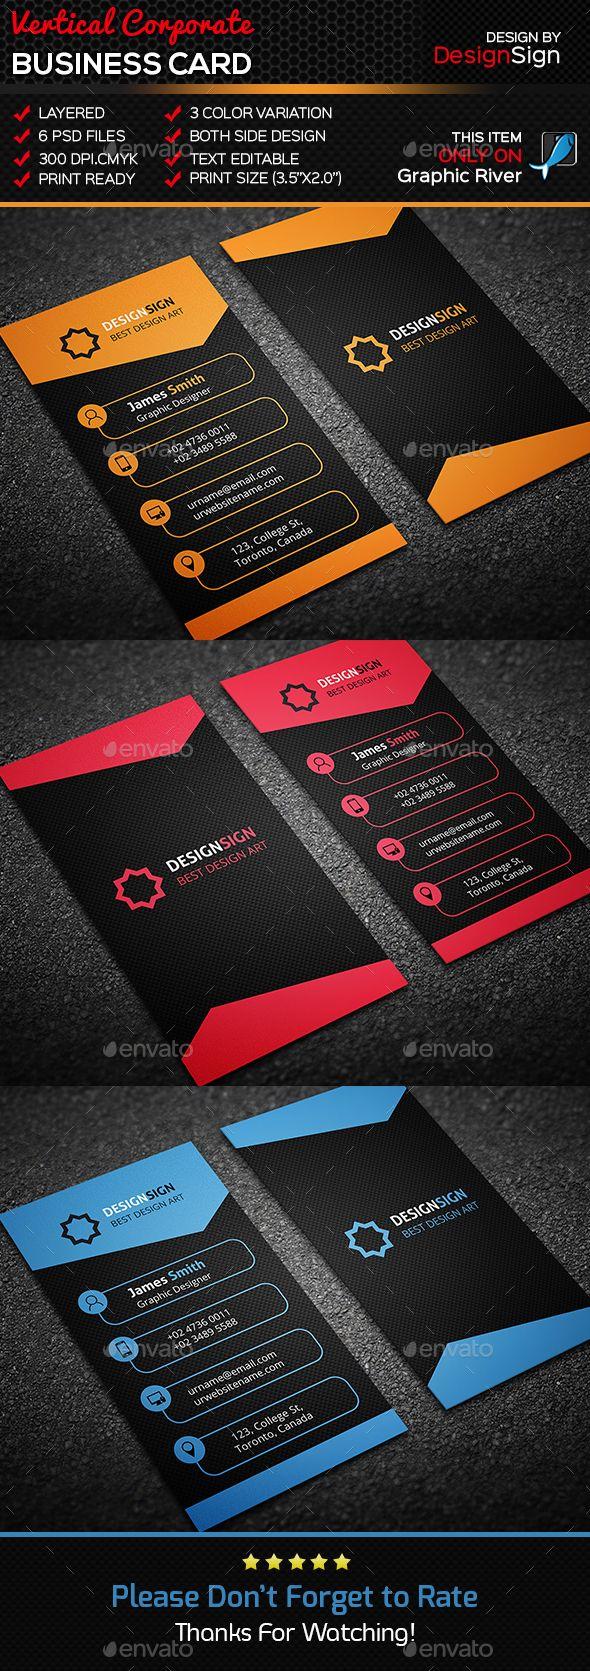 Vertical corporate business card corporate business business vertical corporate business card corporate business cards reheart Choice Image